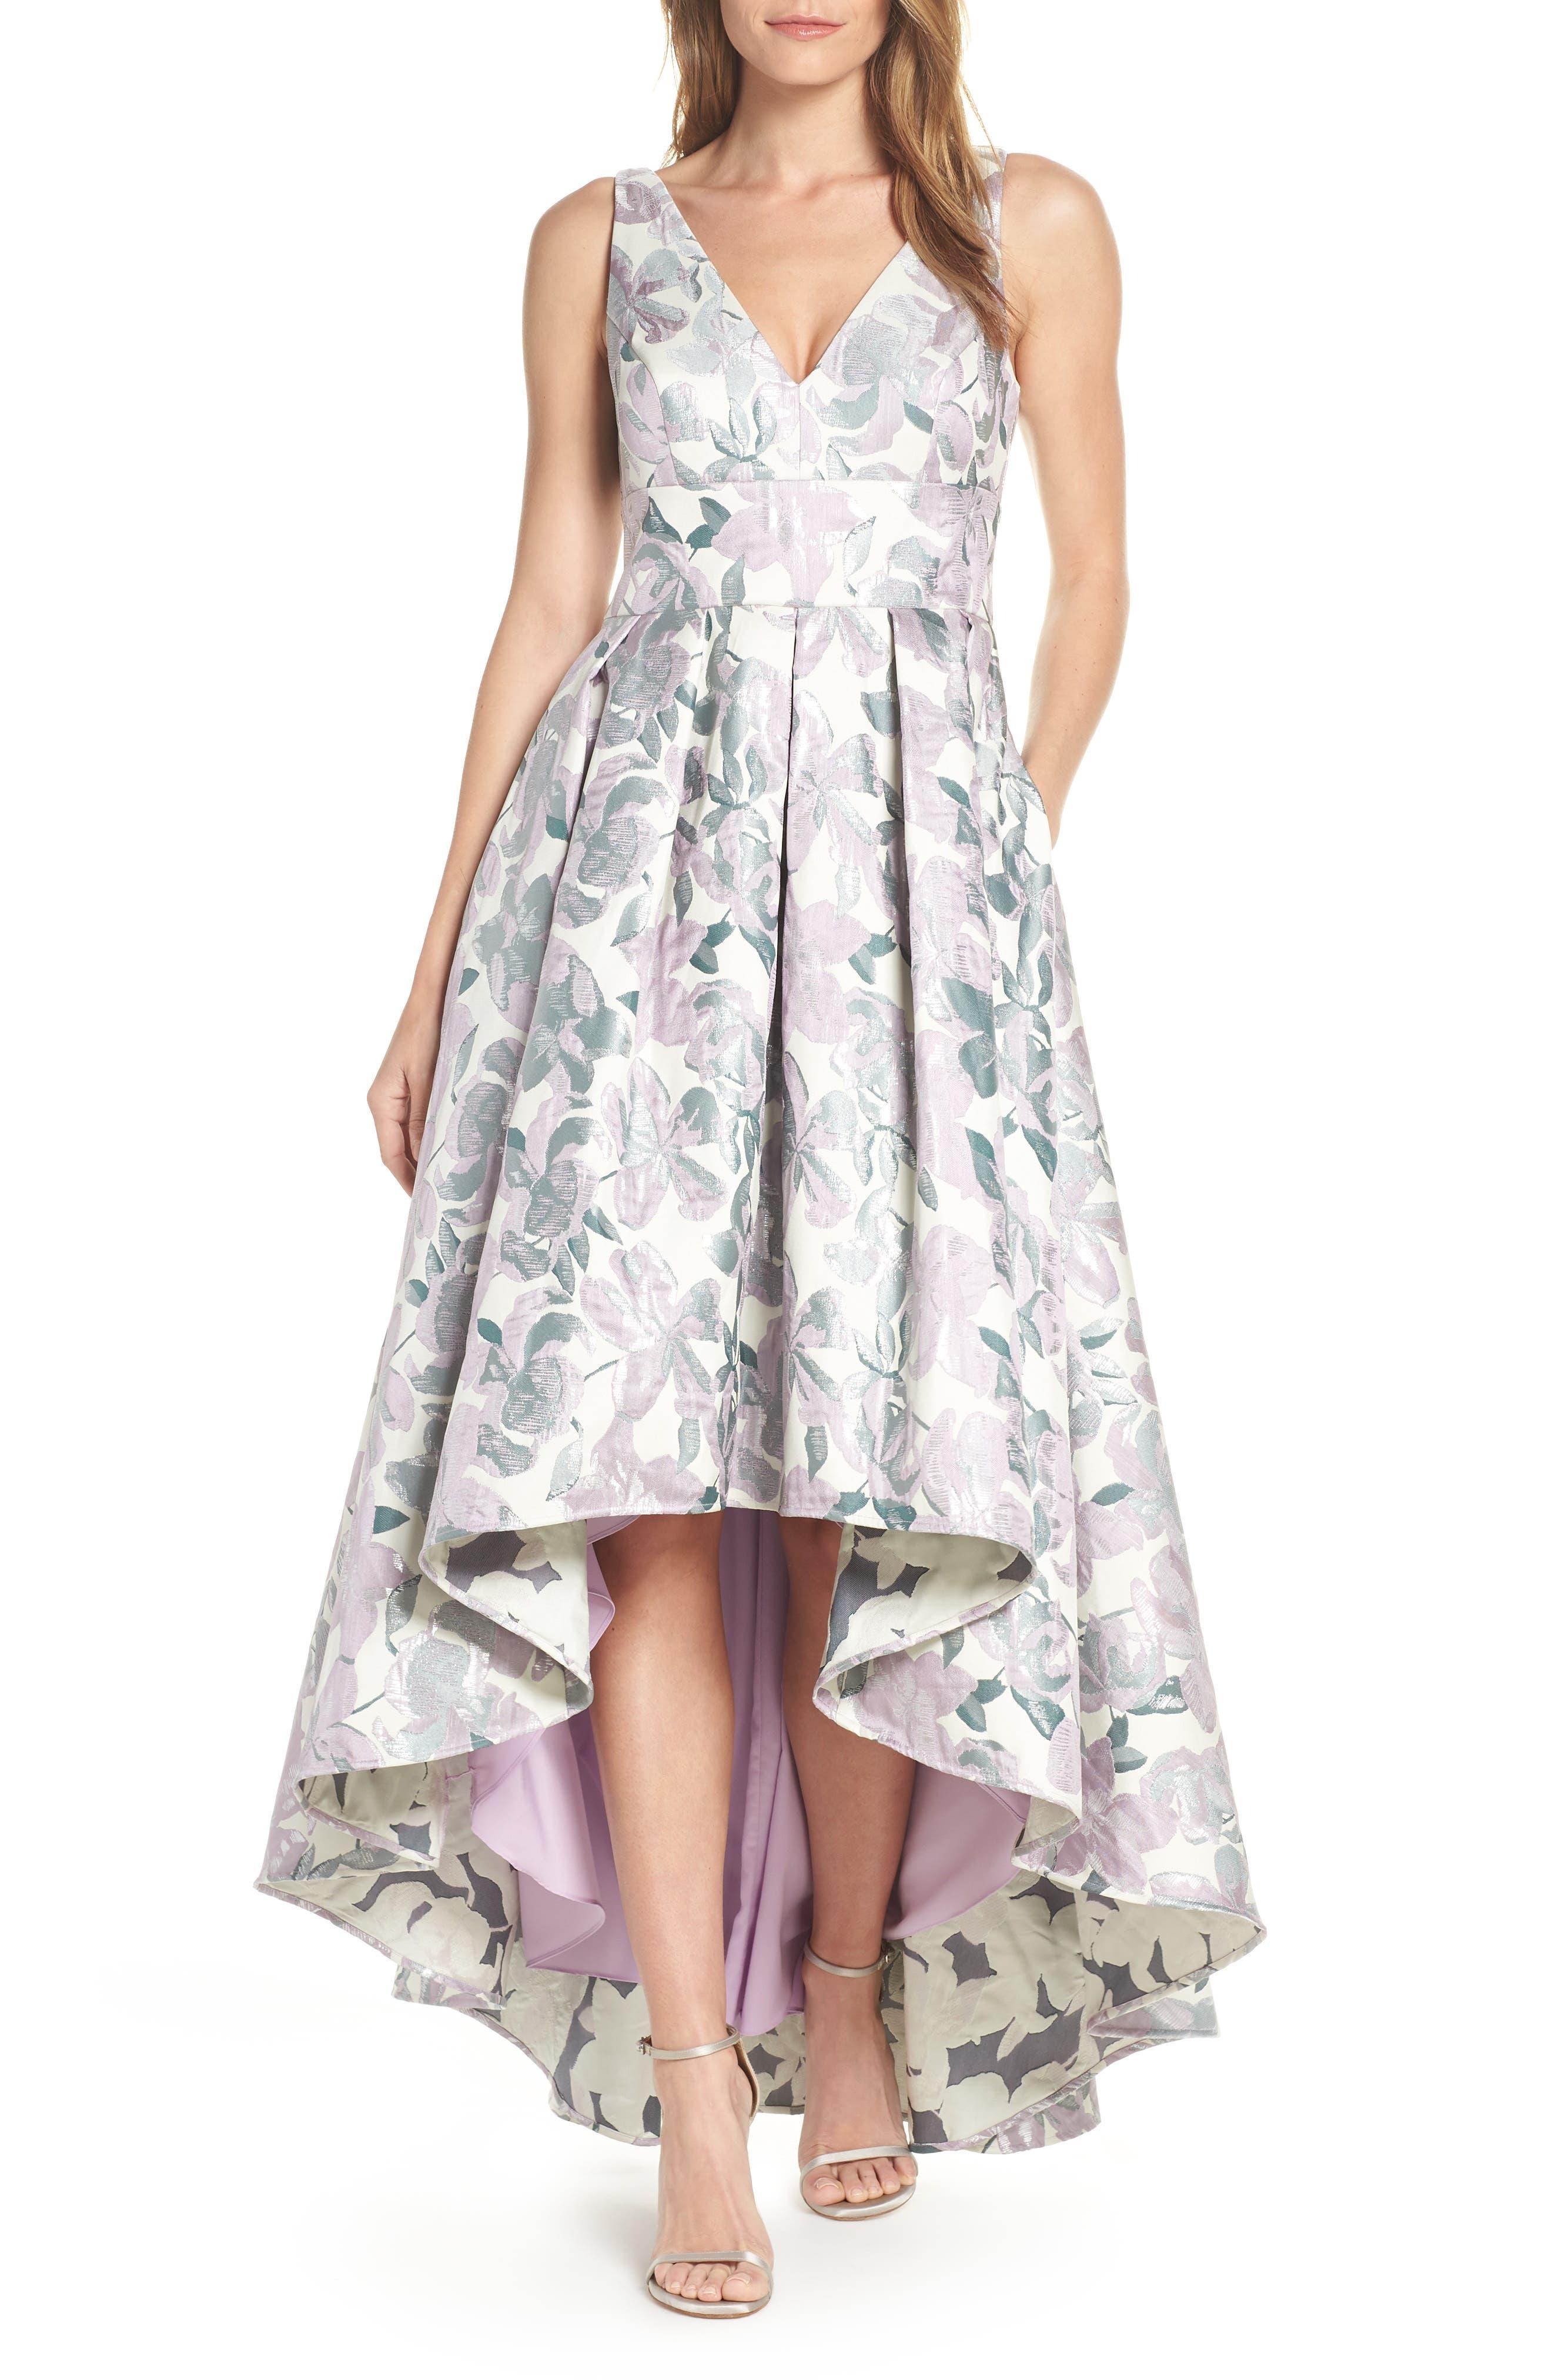 ELIZA J, Floral Jacquard High/Low Evening Dress, Main thumbnail 1, color, LILAC COMBINATION